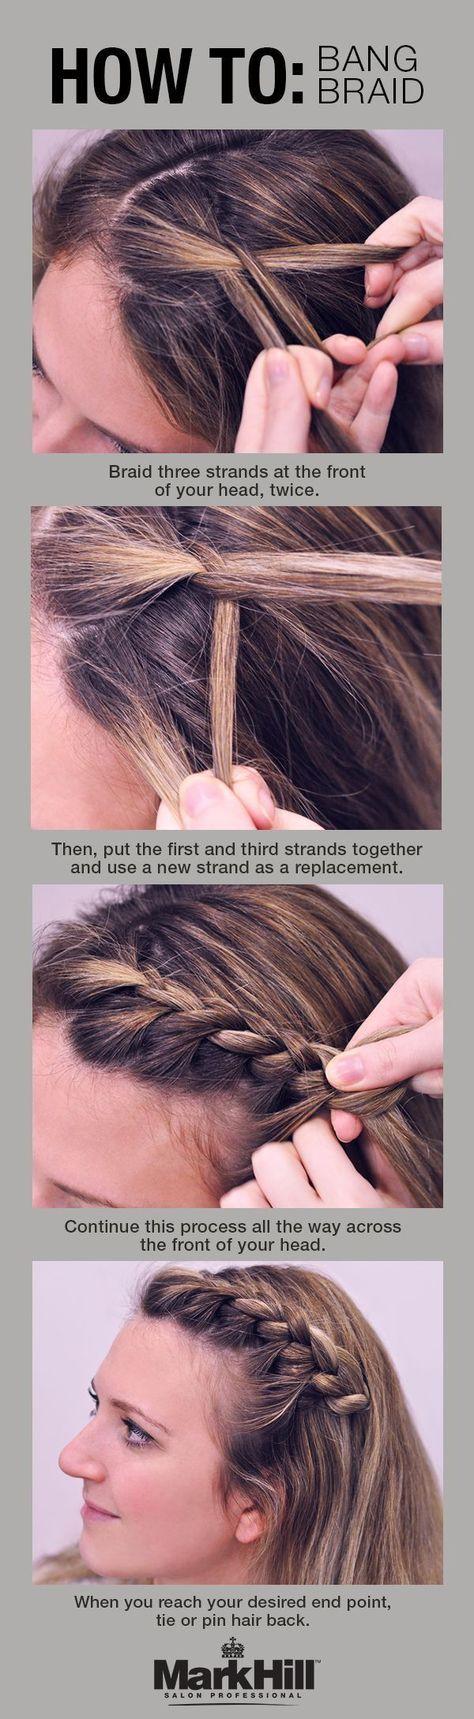 Bang braid